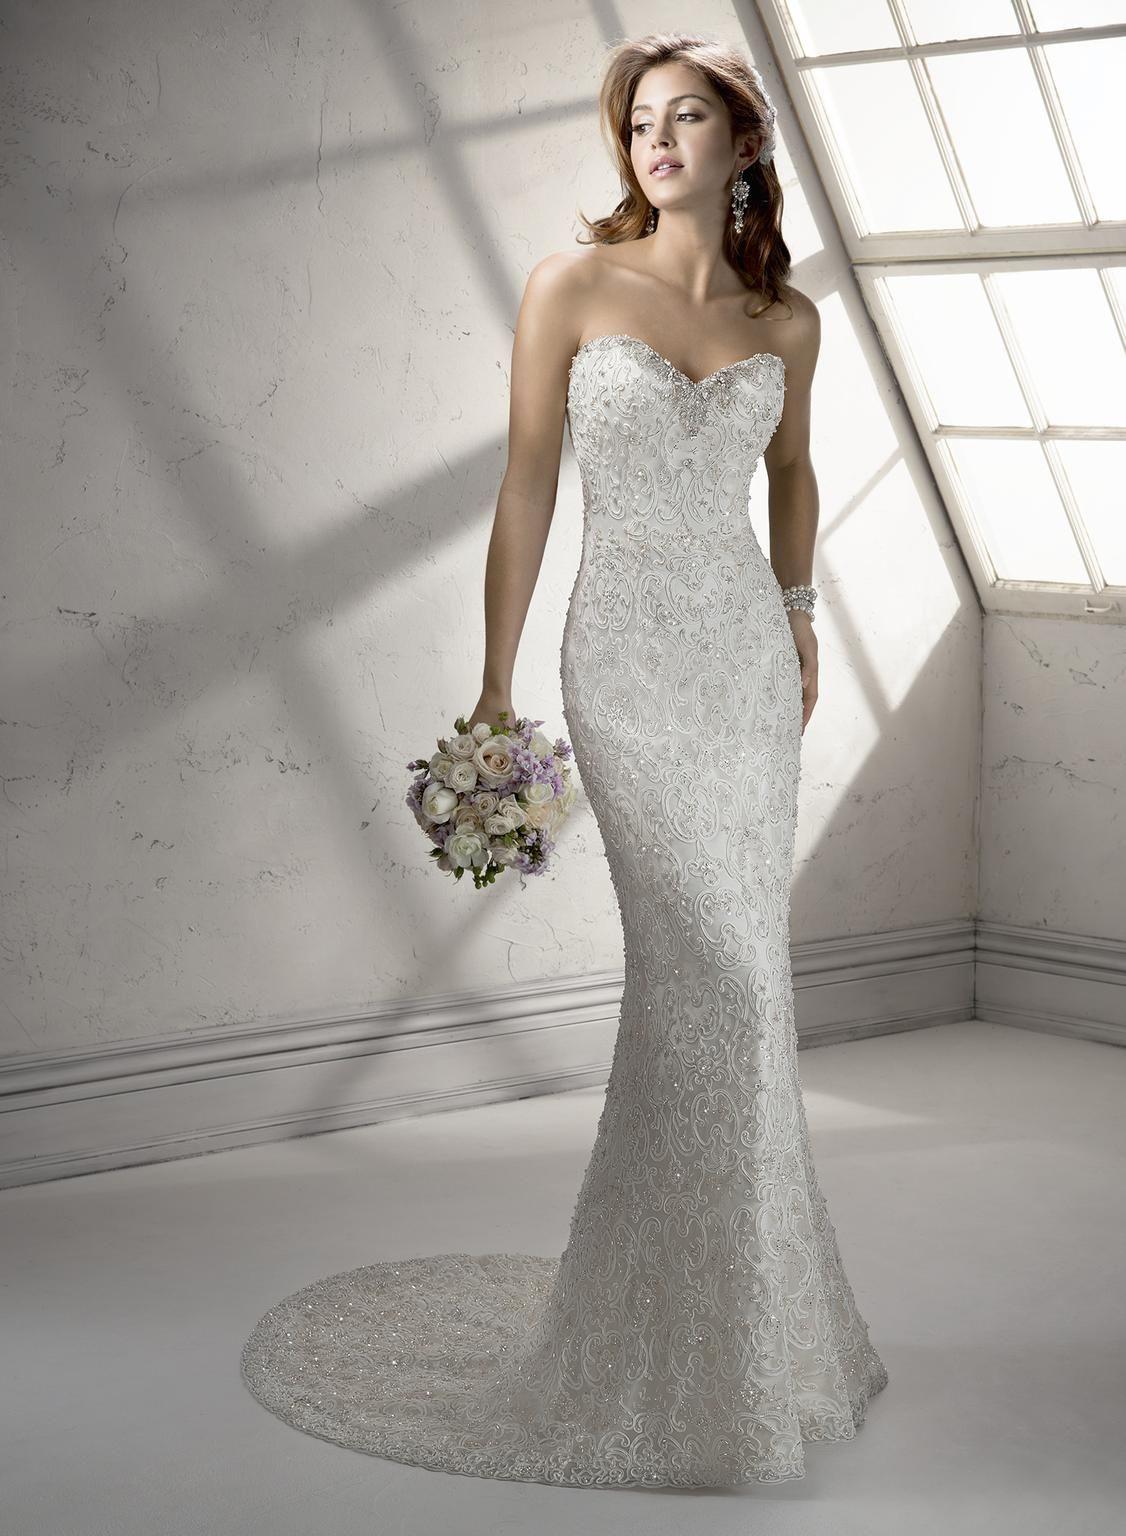 Maggie Sottero Lanie Wedding Dress Sample, Size 12